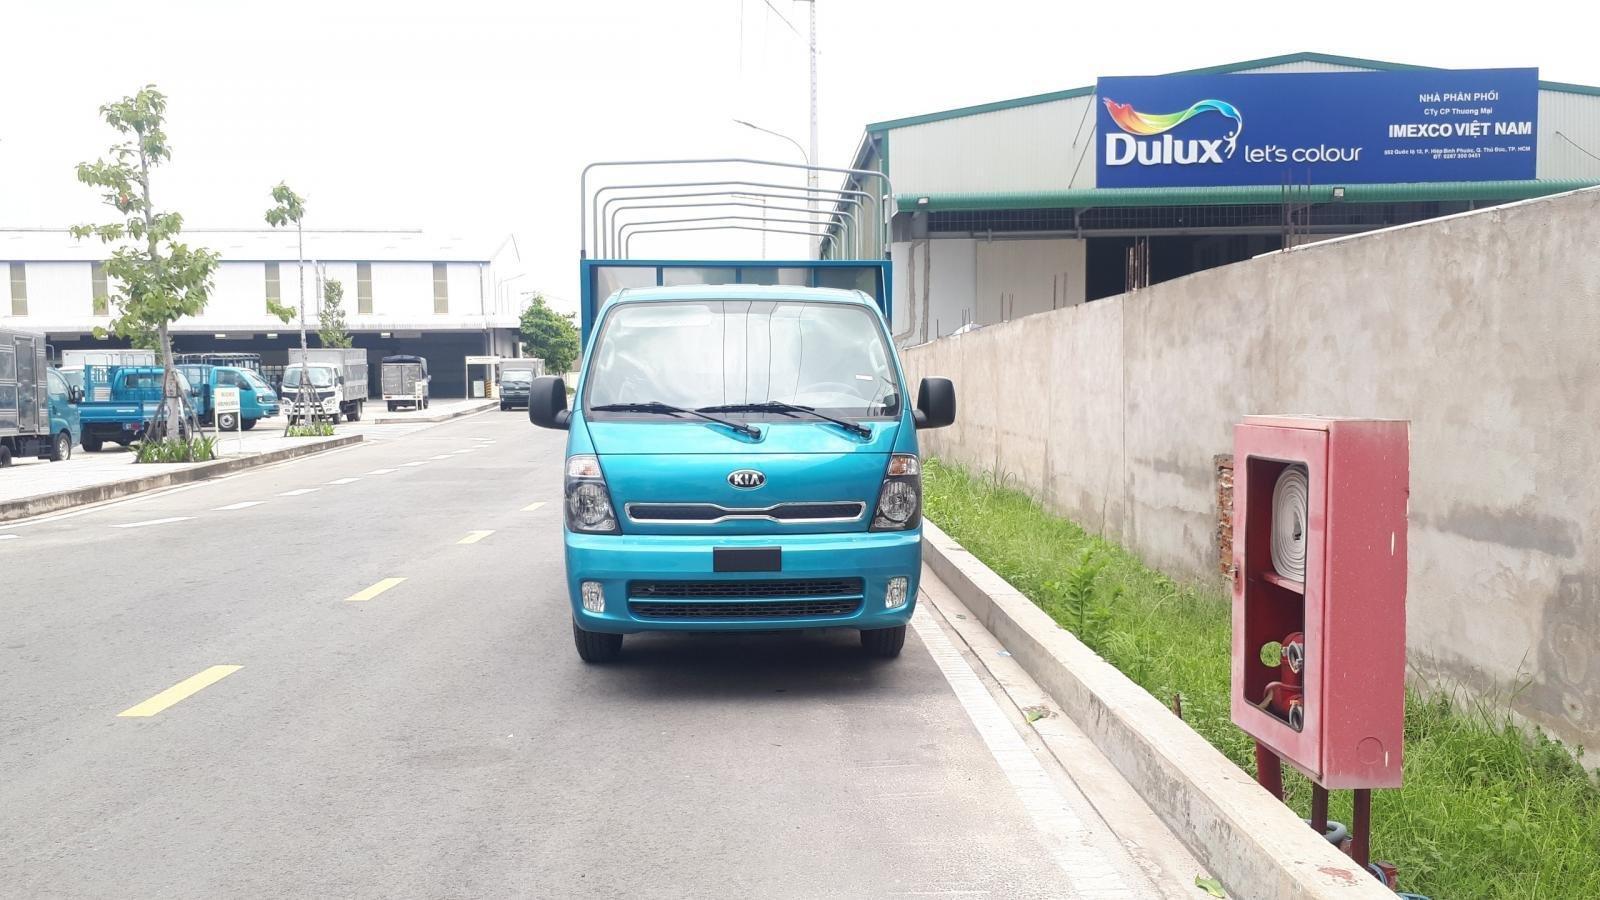 Xe tải Kia 990kg - 1.4 tấn - 1.9 tấn - trả góp - LH em 0938380032 (7)